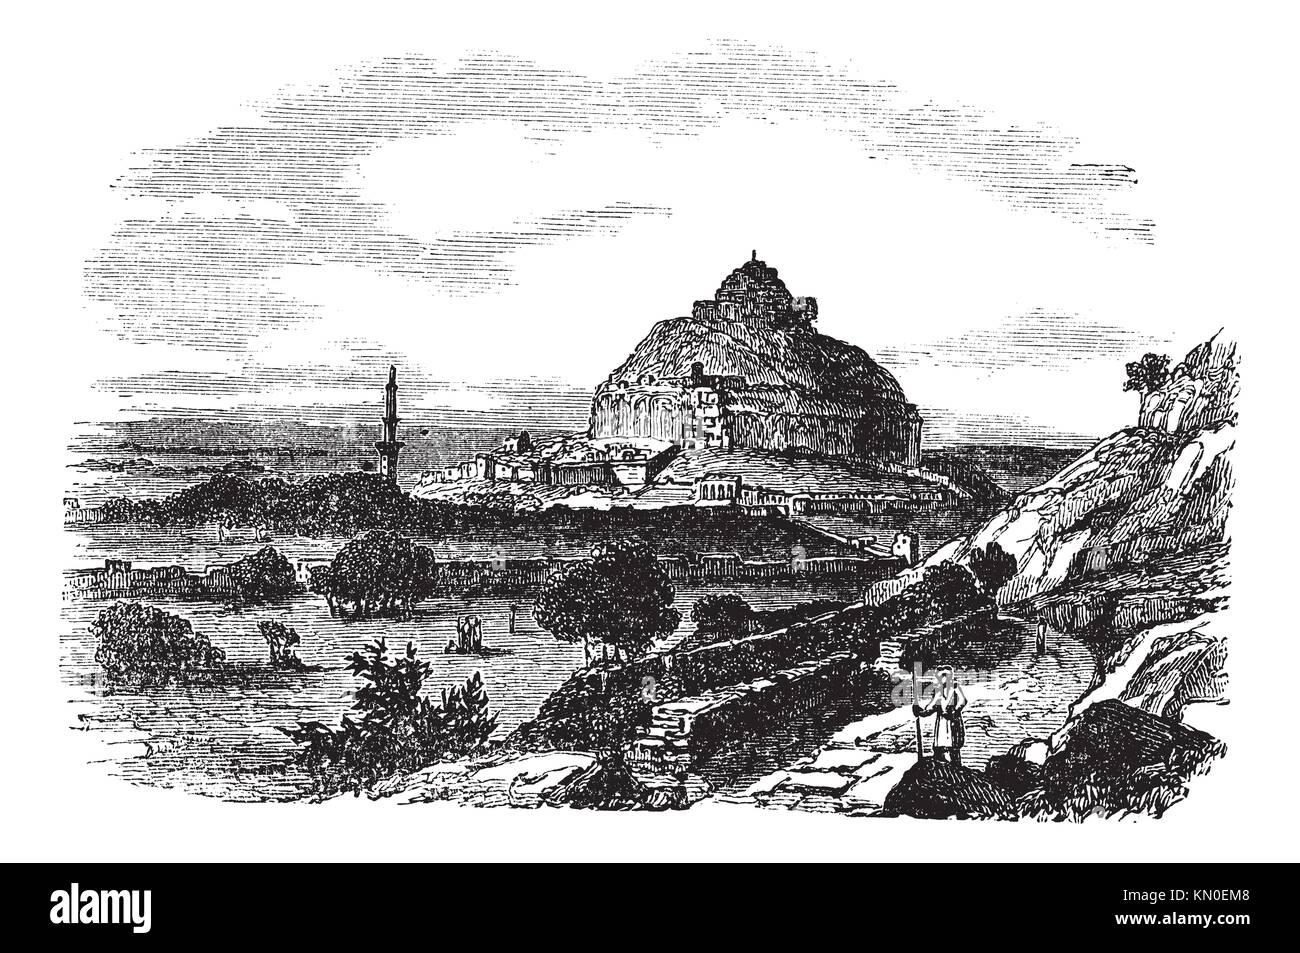 Daulatabad Fort in Maharashtra, India, during the 1890s, vintage engraving  Old engraved illustration of Daulatabad - Stock Image